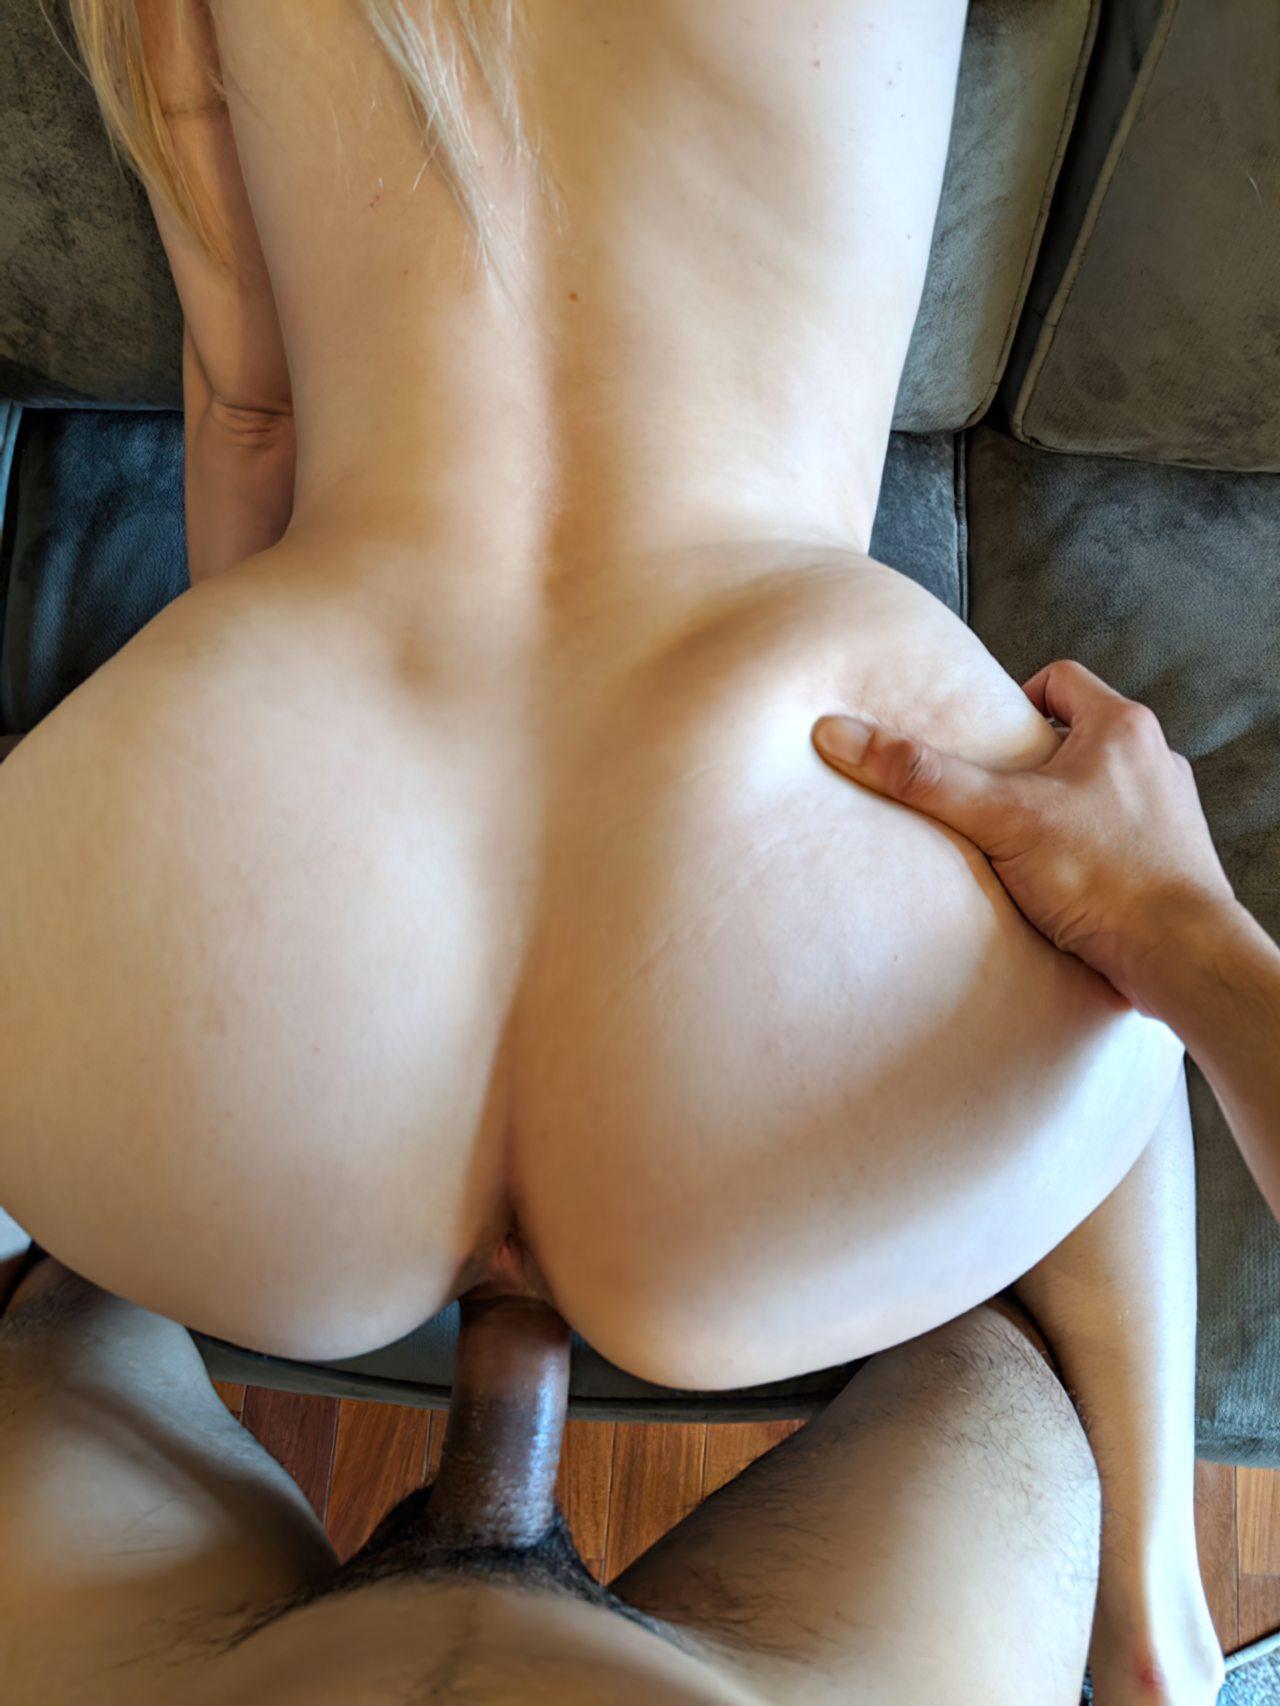 Fotos Sexo Nudes Loira Anonima (10)